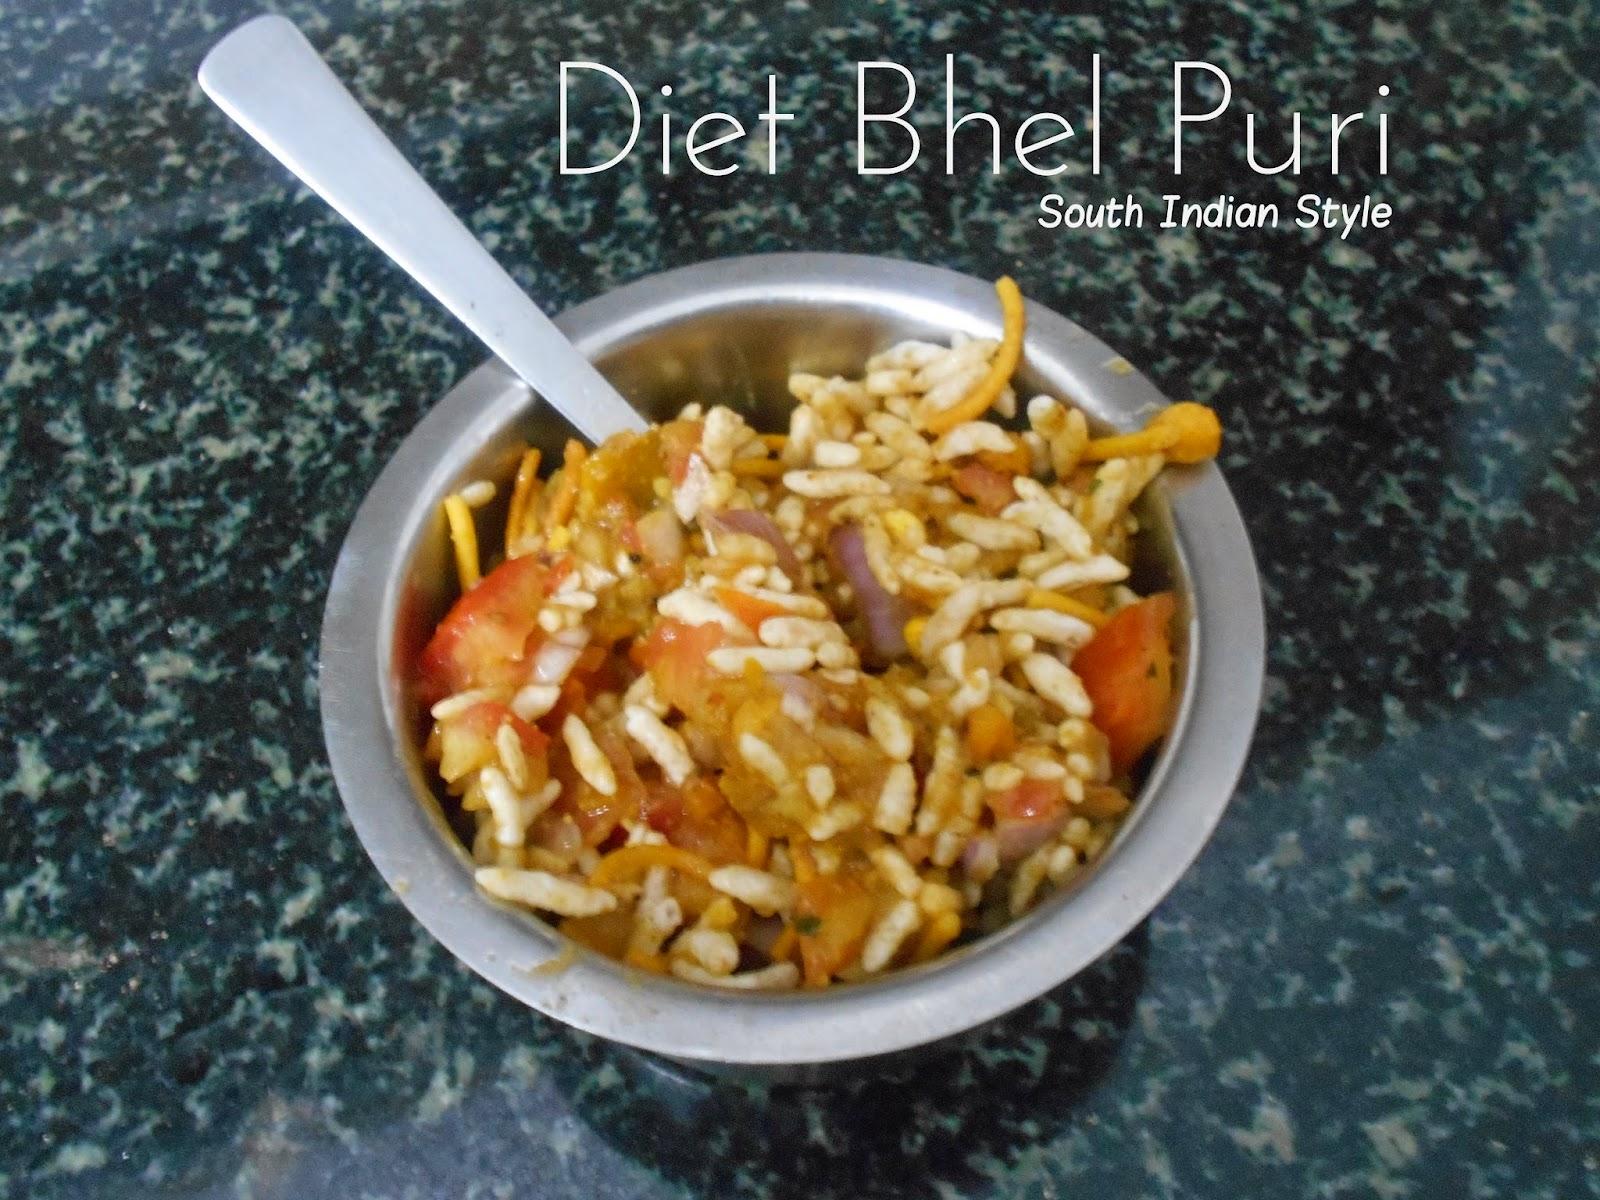 Diet Bhel Puri